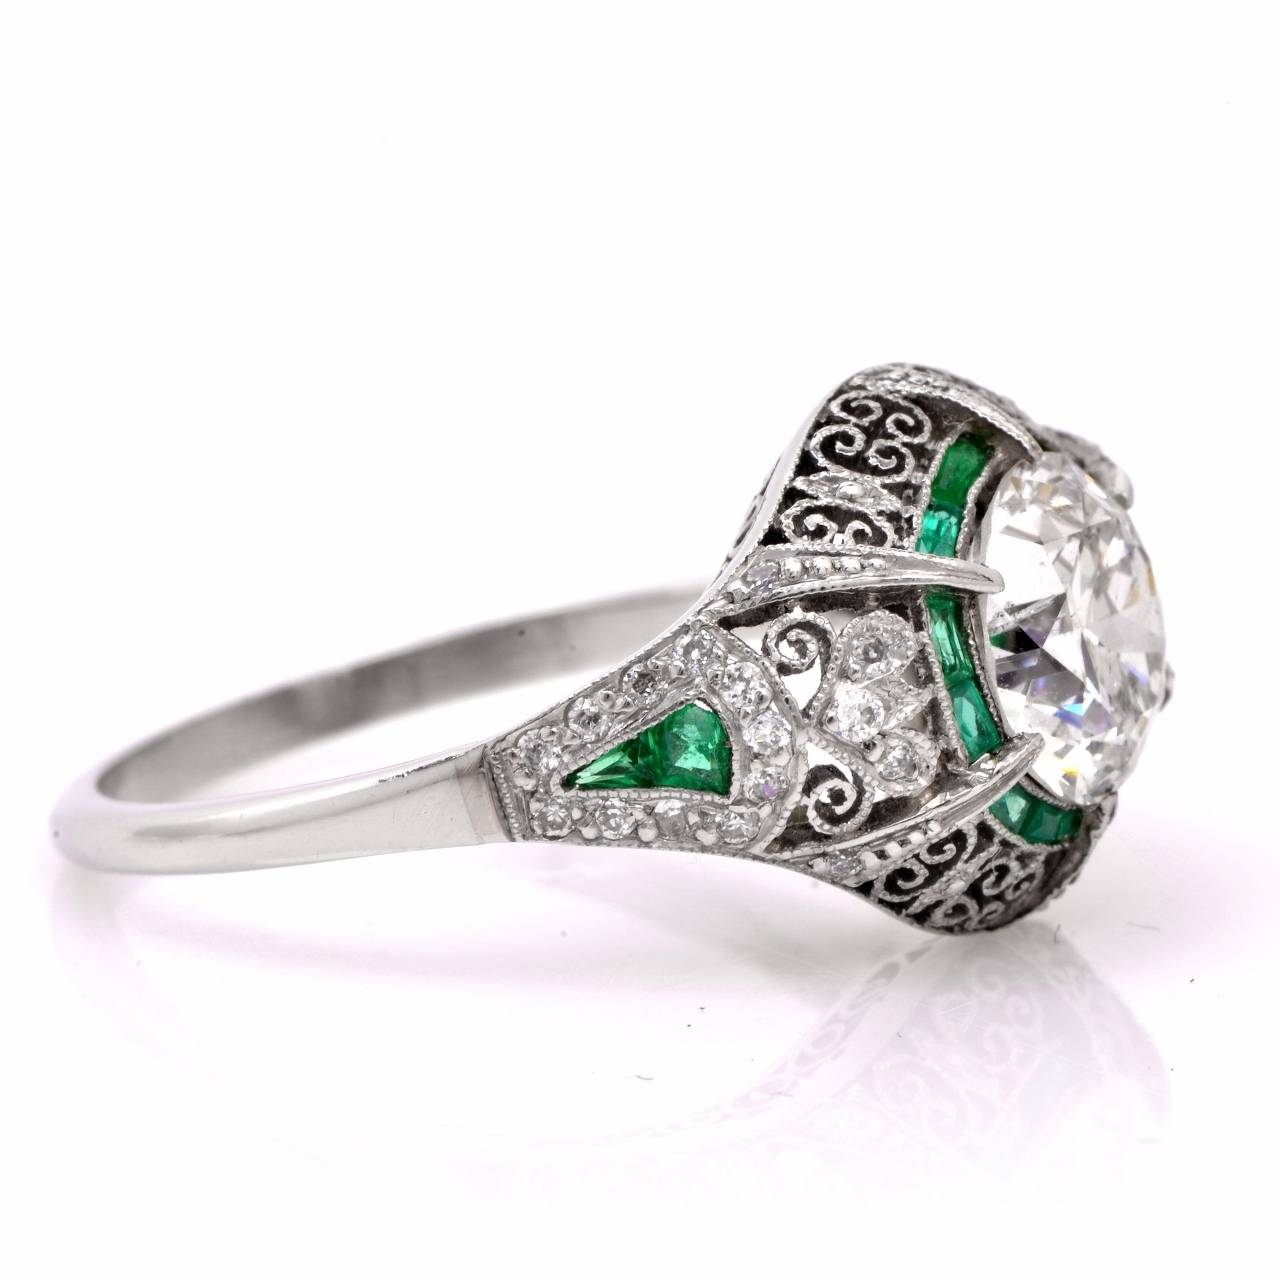 Wedding Ring Filigree 39 Awesome Emerald filigree engagement rings